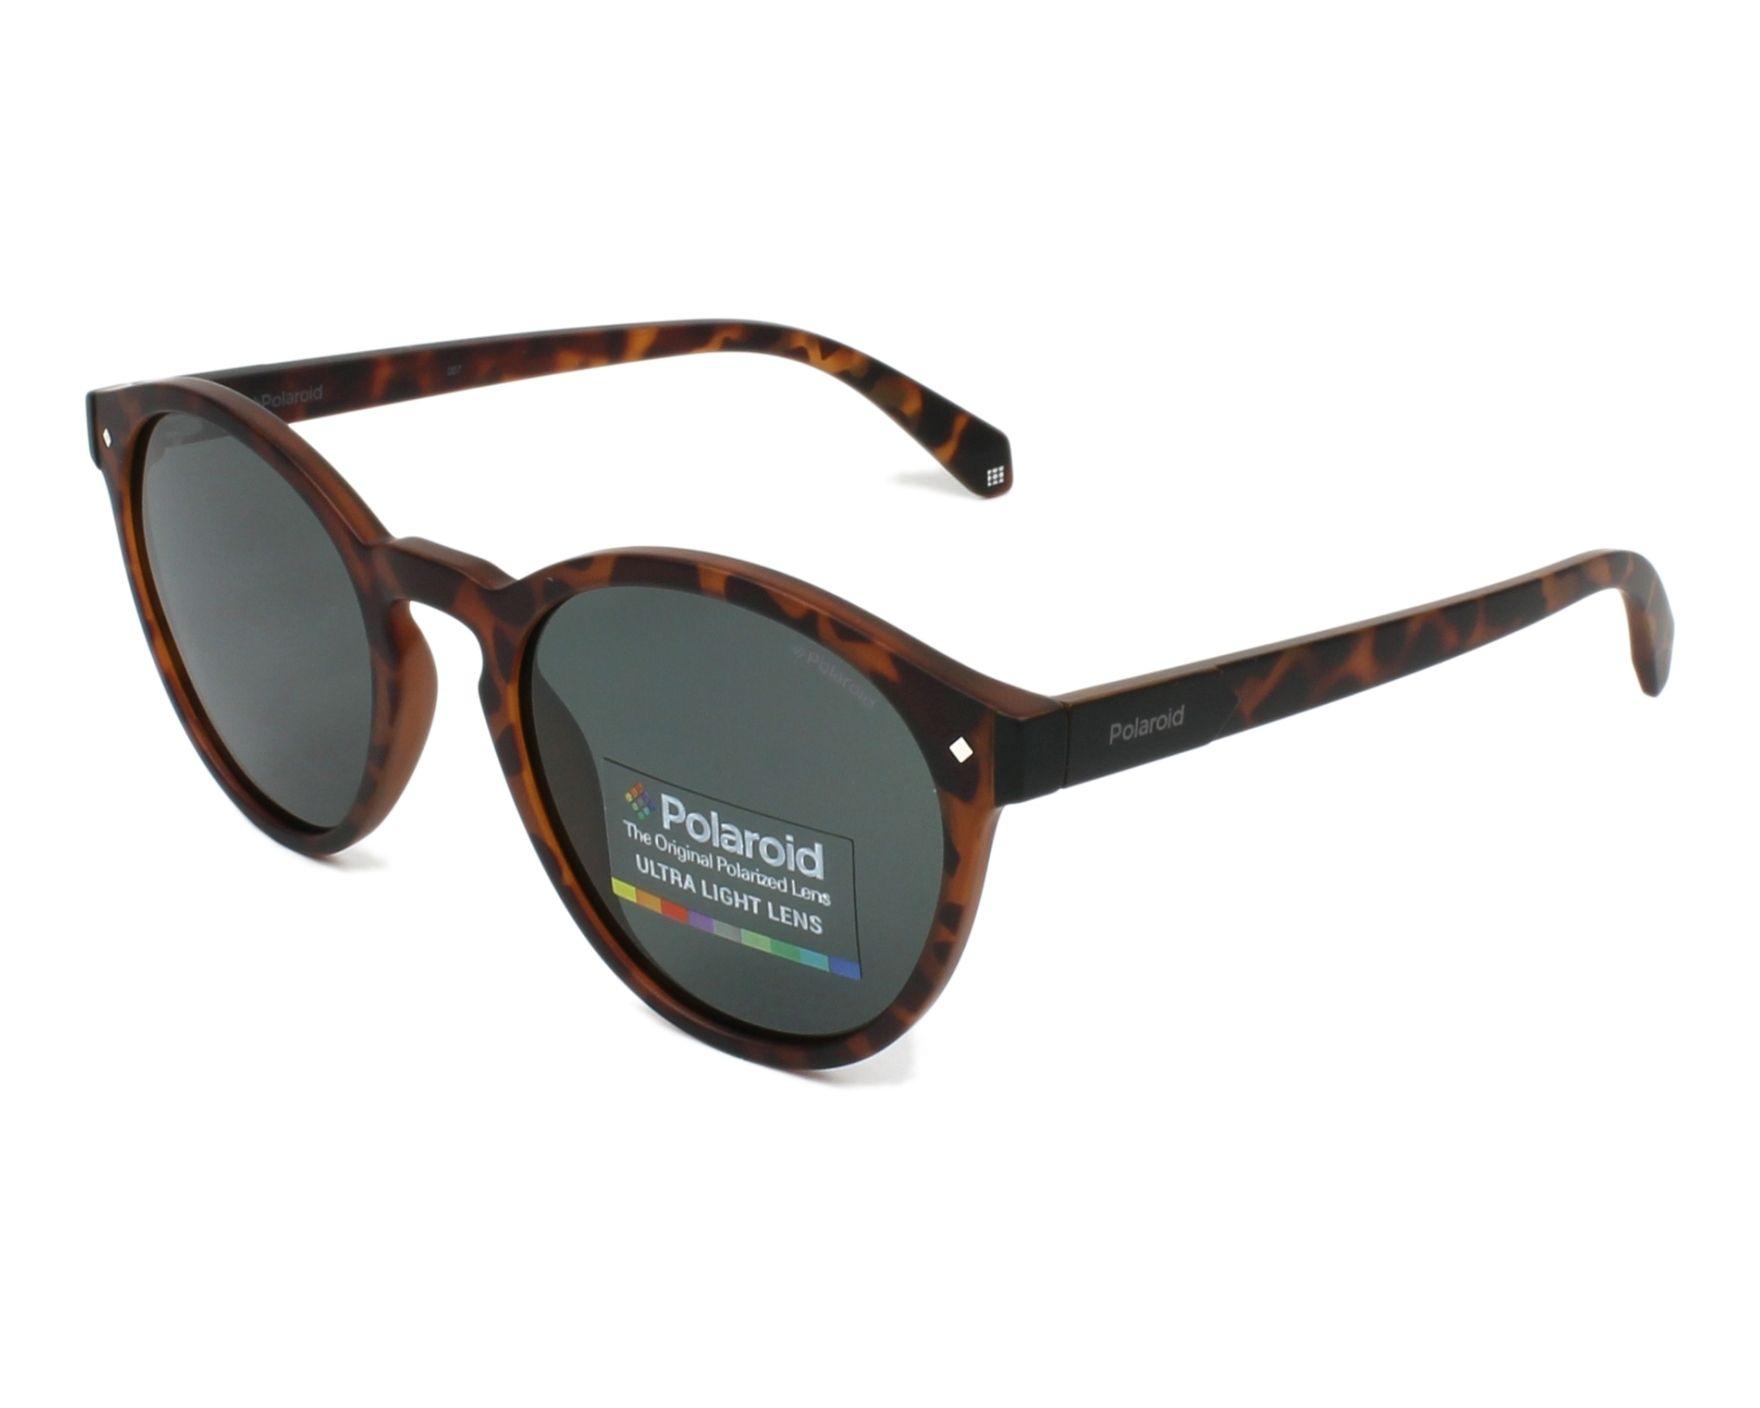 a6cff774b71 Sunglasses Polaroid PLD-6034-S N9P M9 51-21 Havana profile view